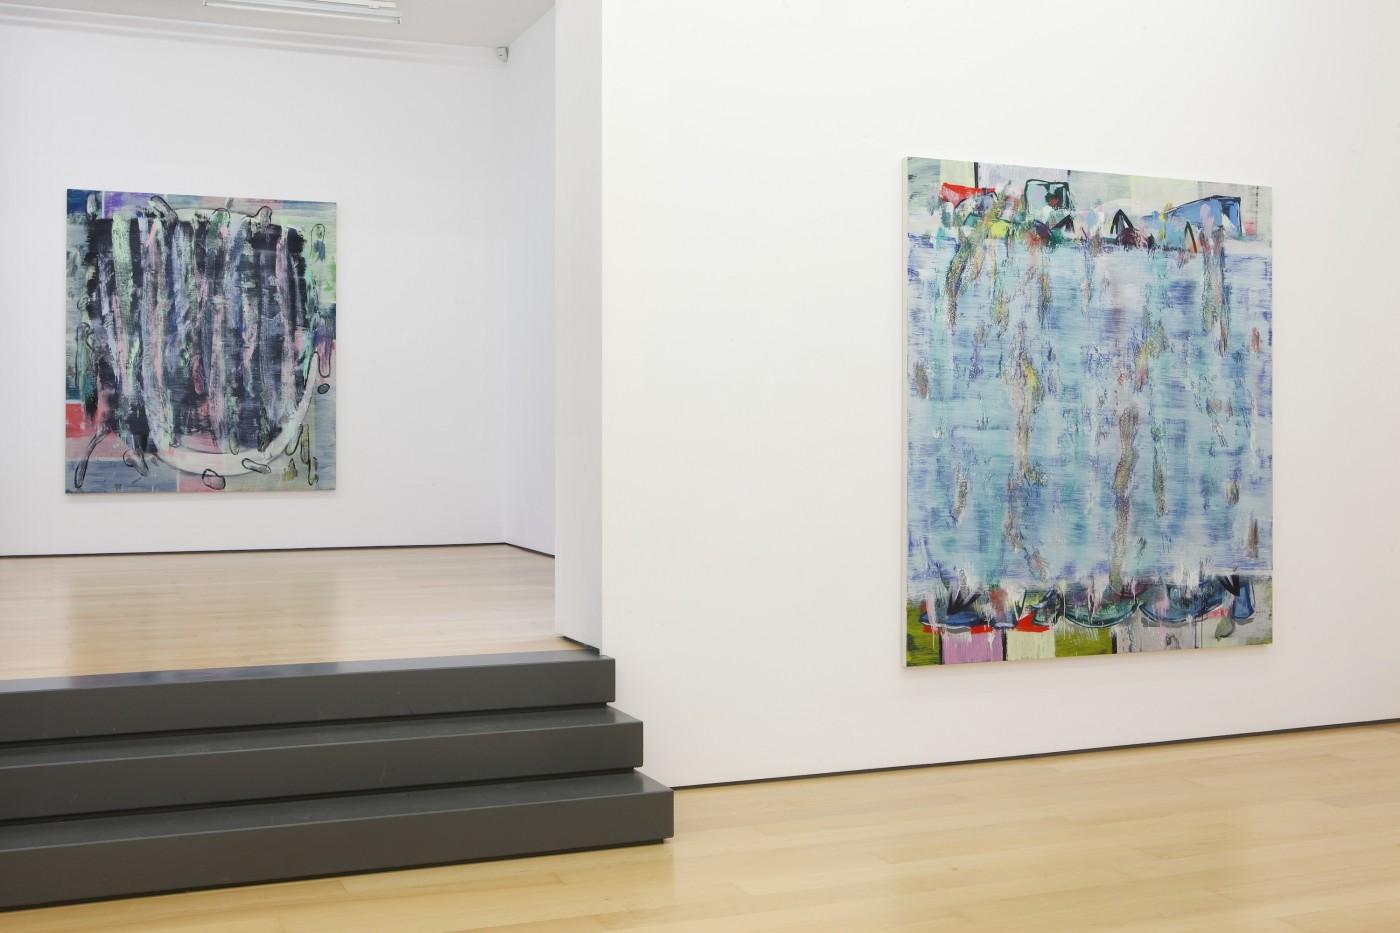 Jon Pestoni, 2014, Installation view